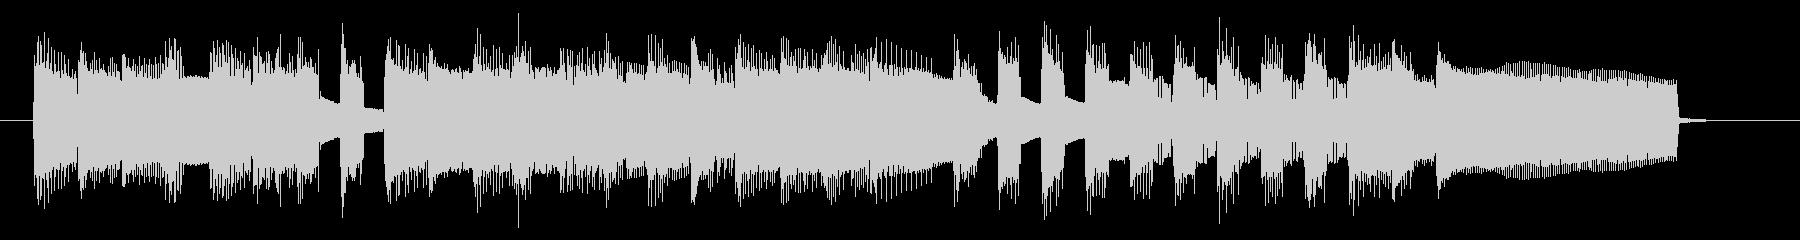 NES STG C07-2(クリア2)の未再生の波形